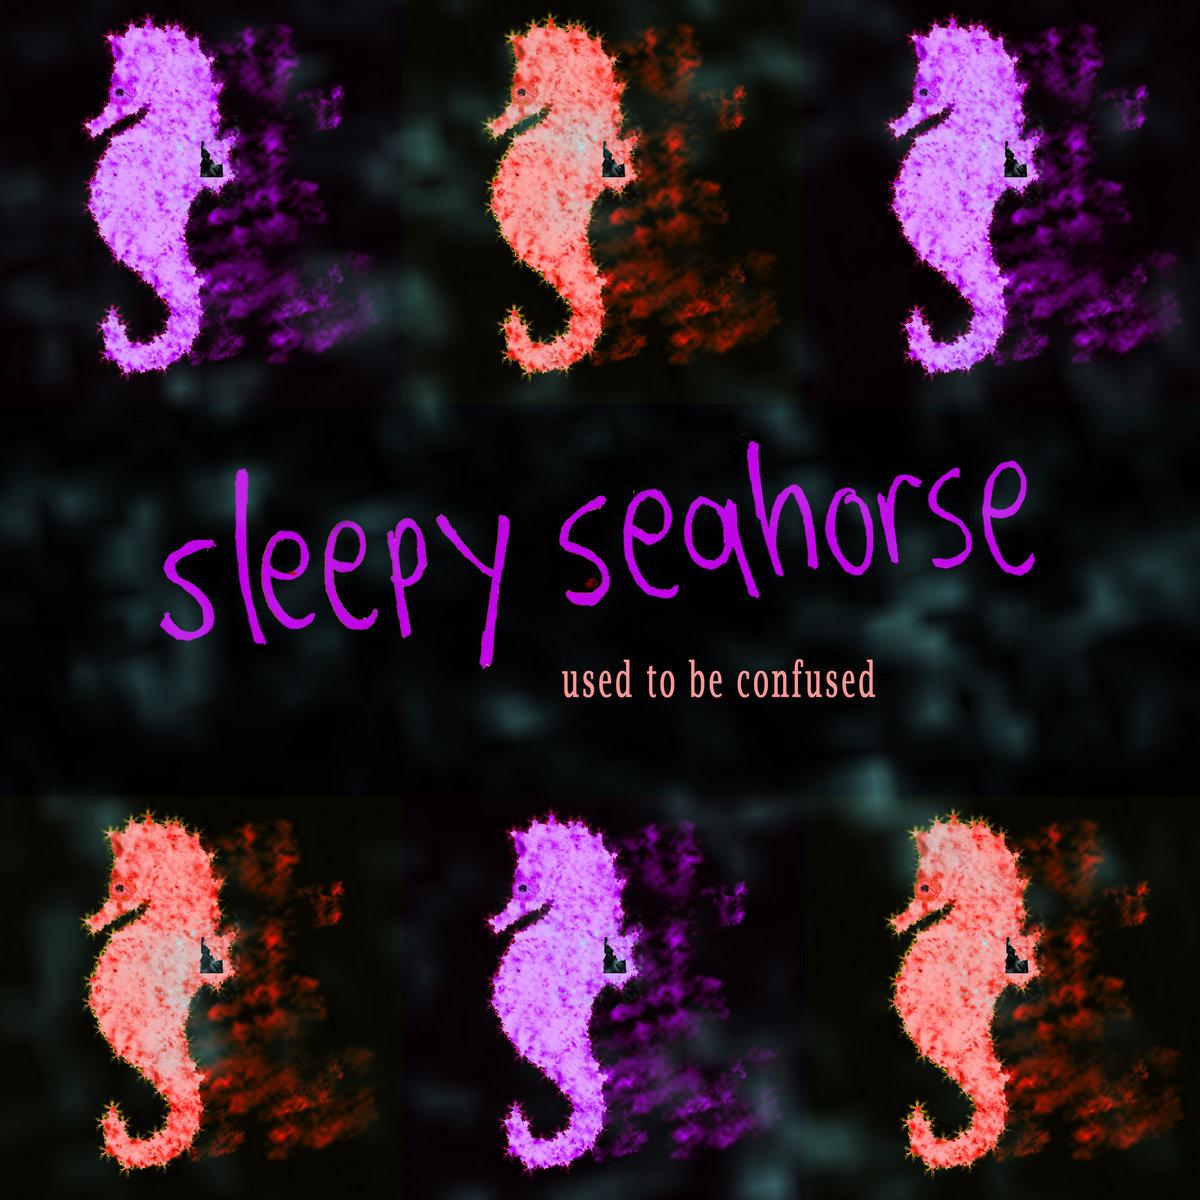 Sleepy seahorse by sleepy seahorse solutioingenieria Image collections